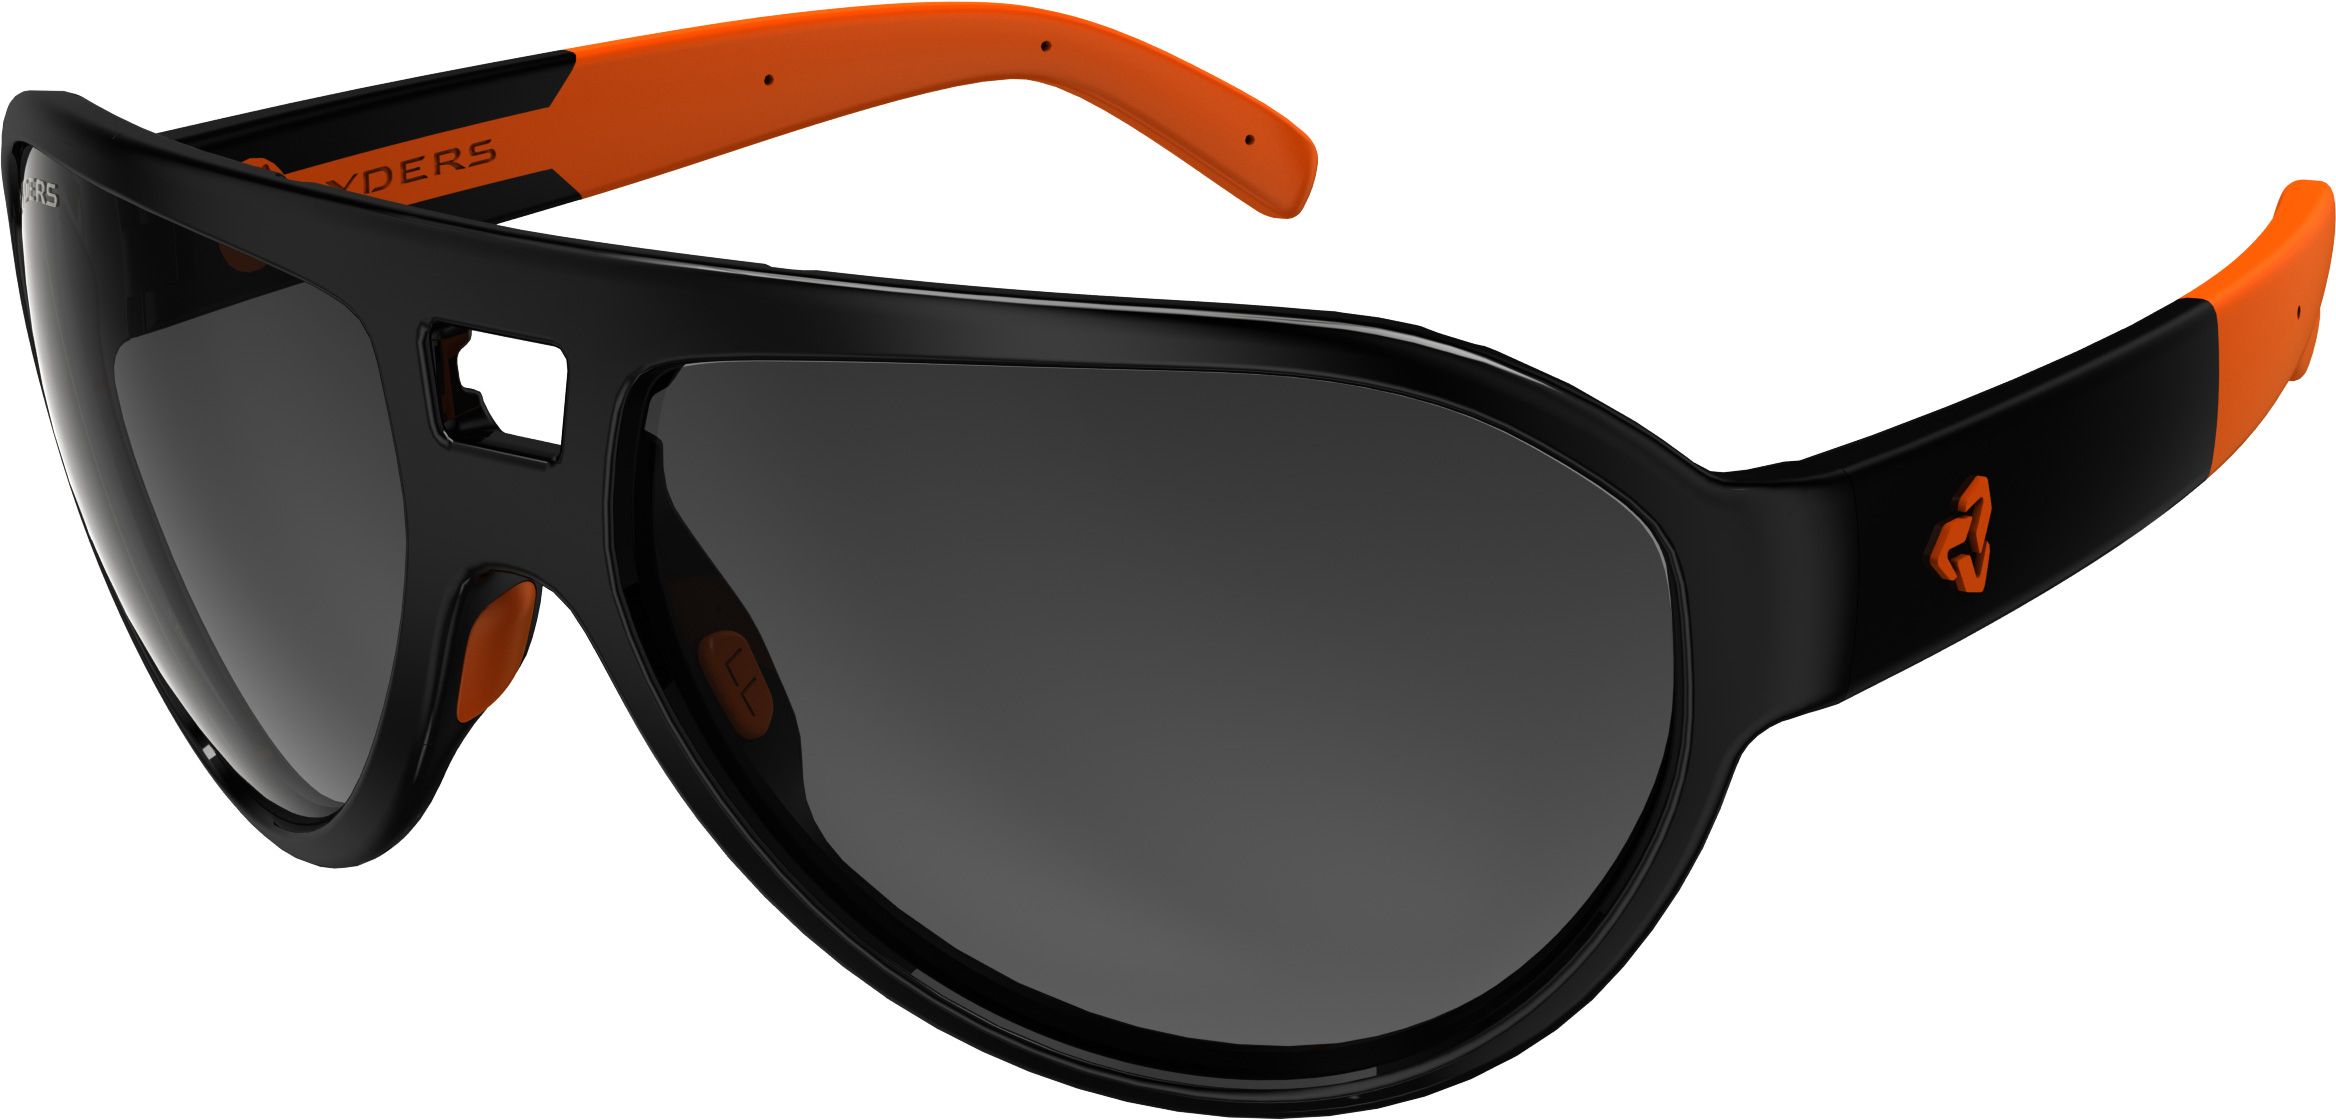 f75a4d24f0 Ryders Eyewear Hiline Sunglasses - Unisex